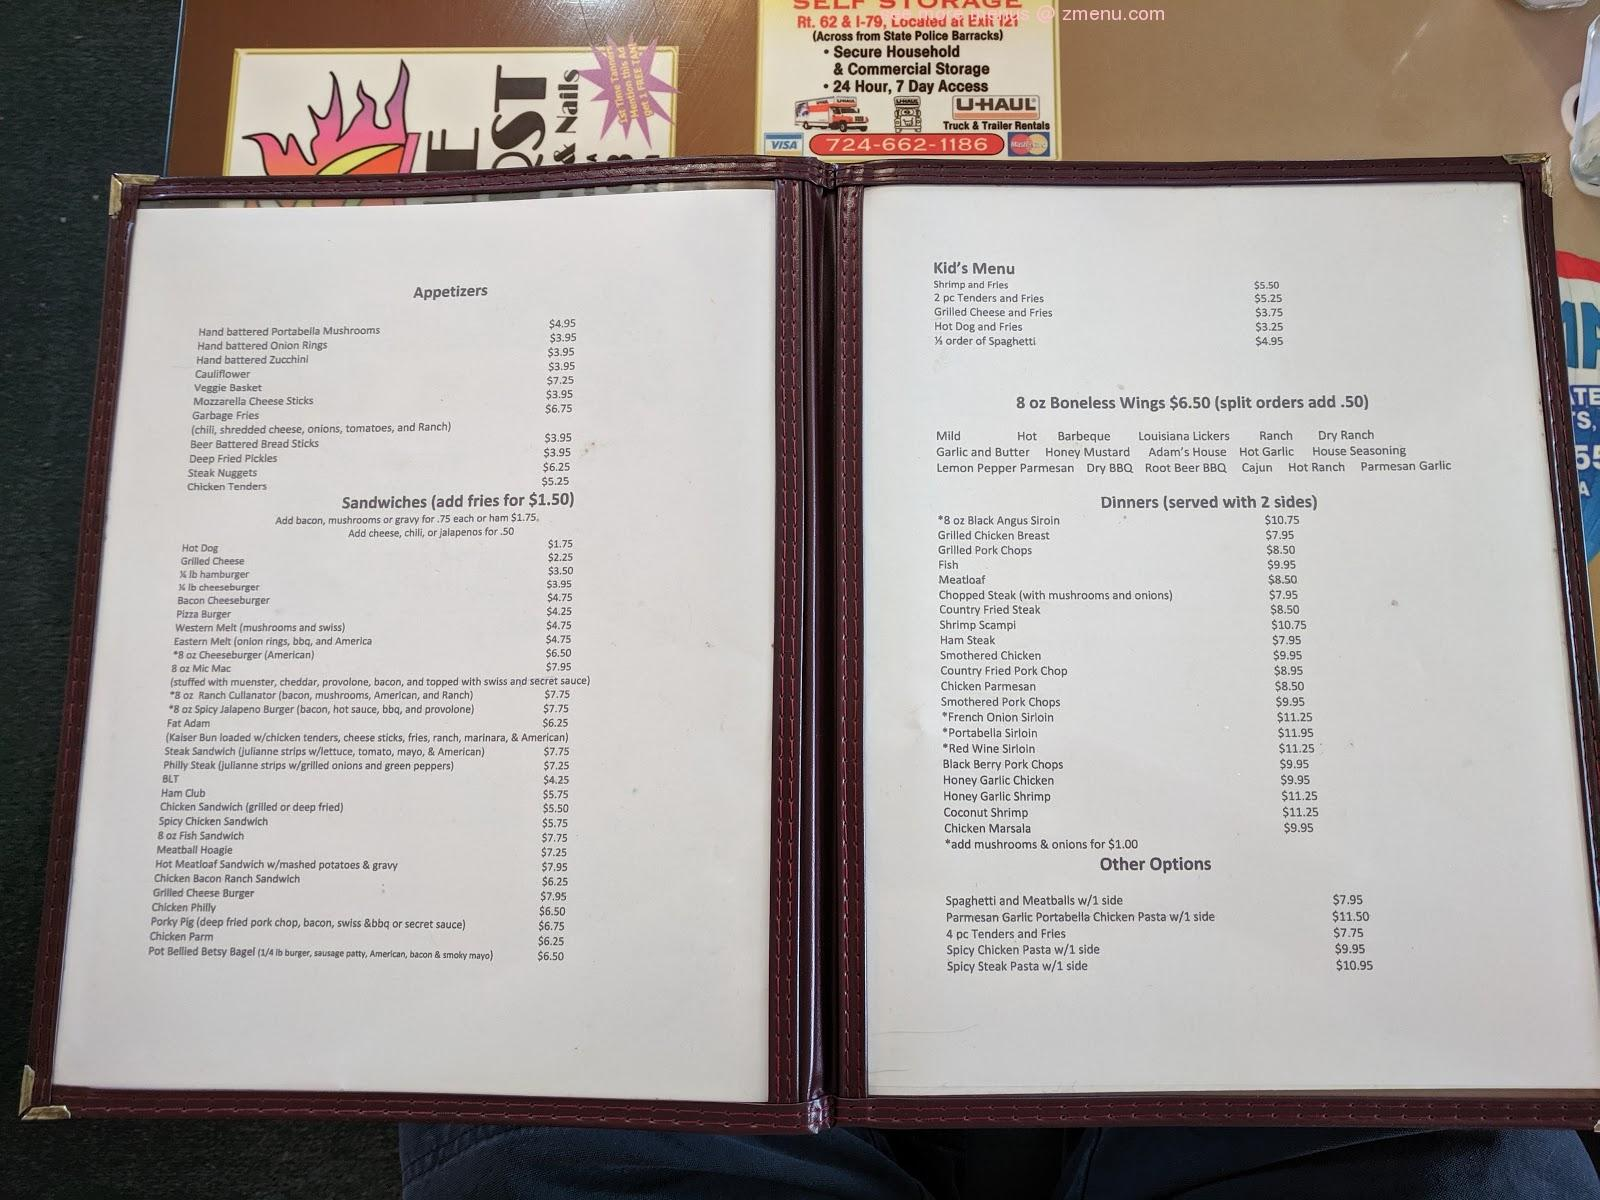 Online Menu Of Mcculloughs Kitchen Table Restaurant Stoneboro Pennsylvania 16154 Zmenu